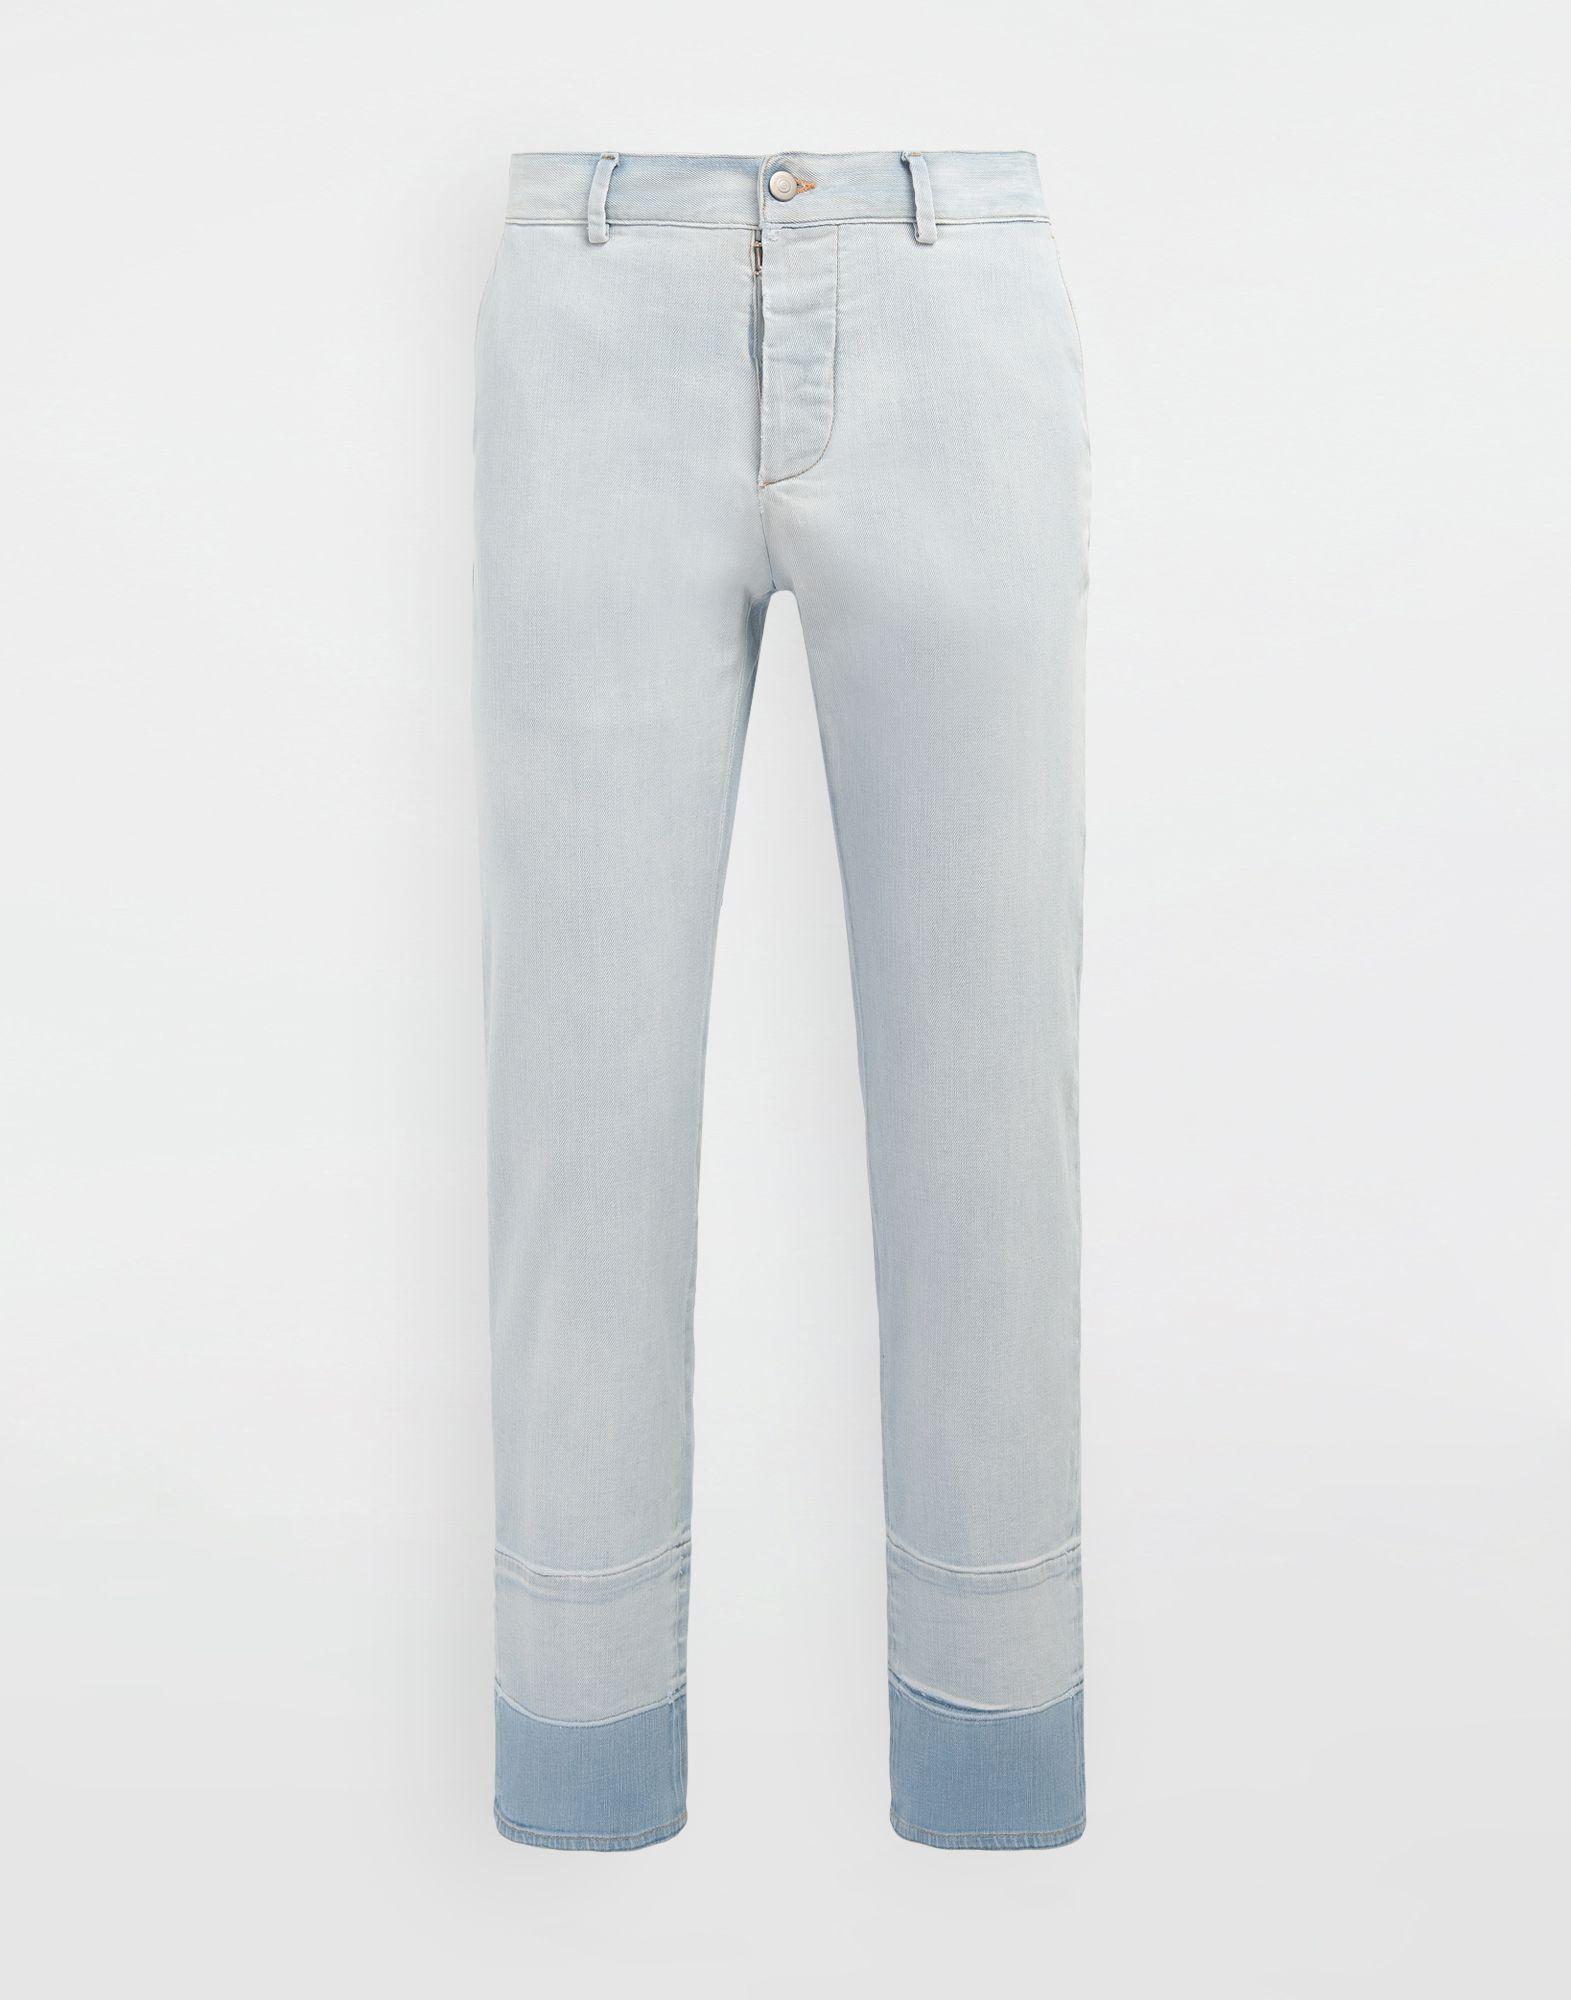 MAISON MARGIELA Bleached indigo denim pants Casual pants Man f